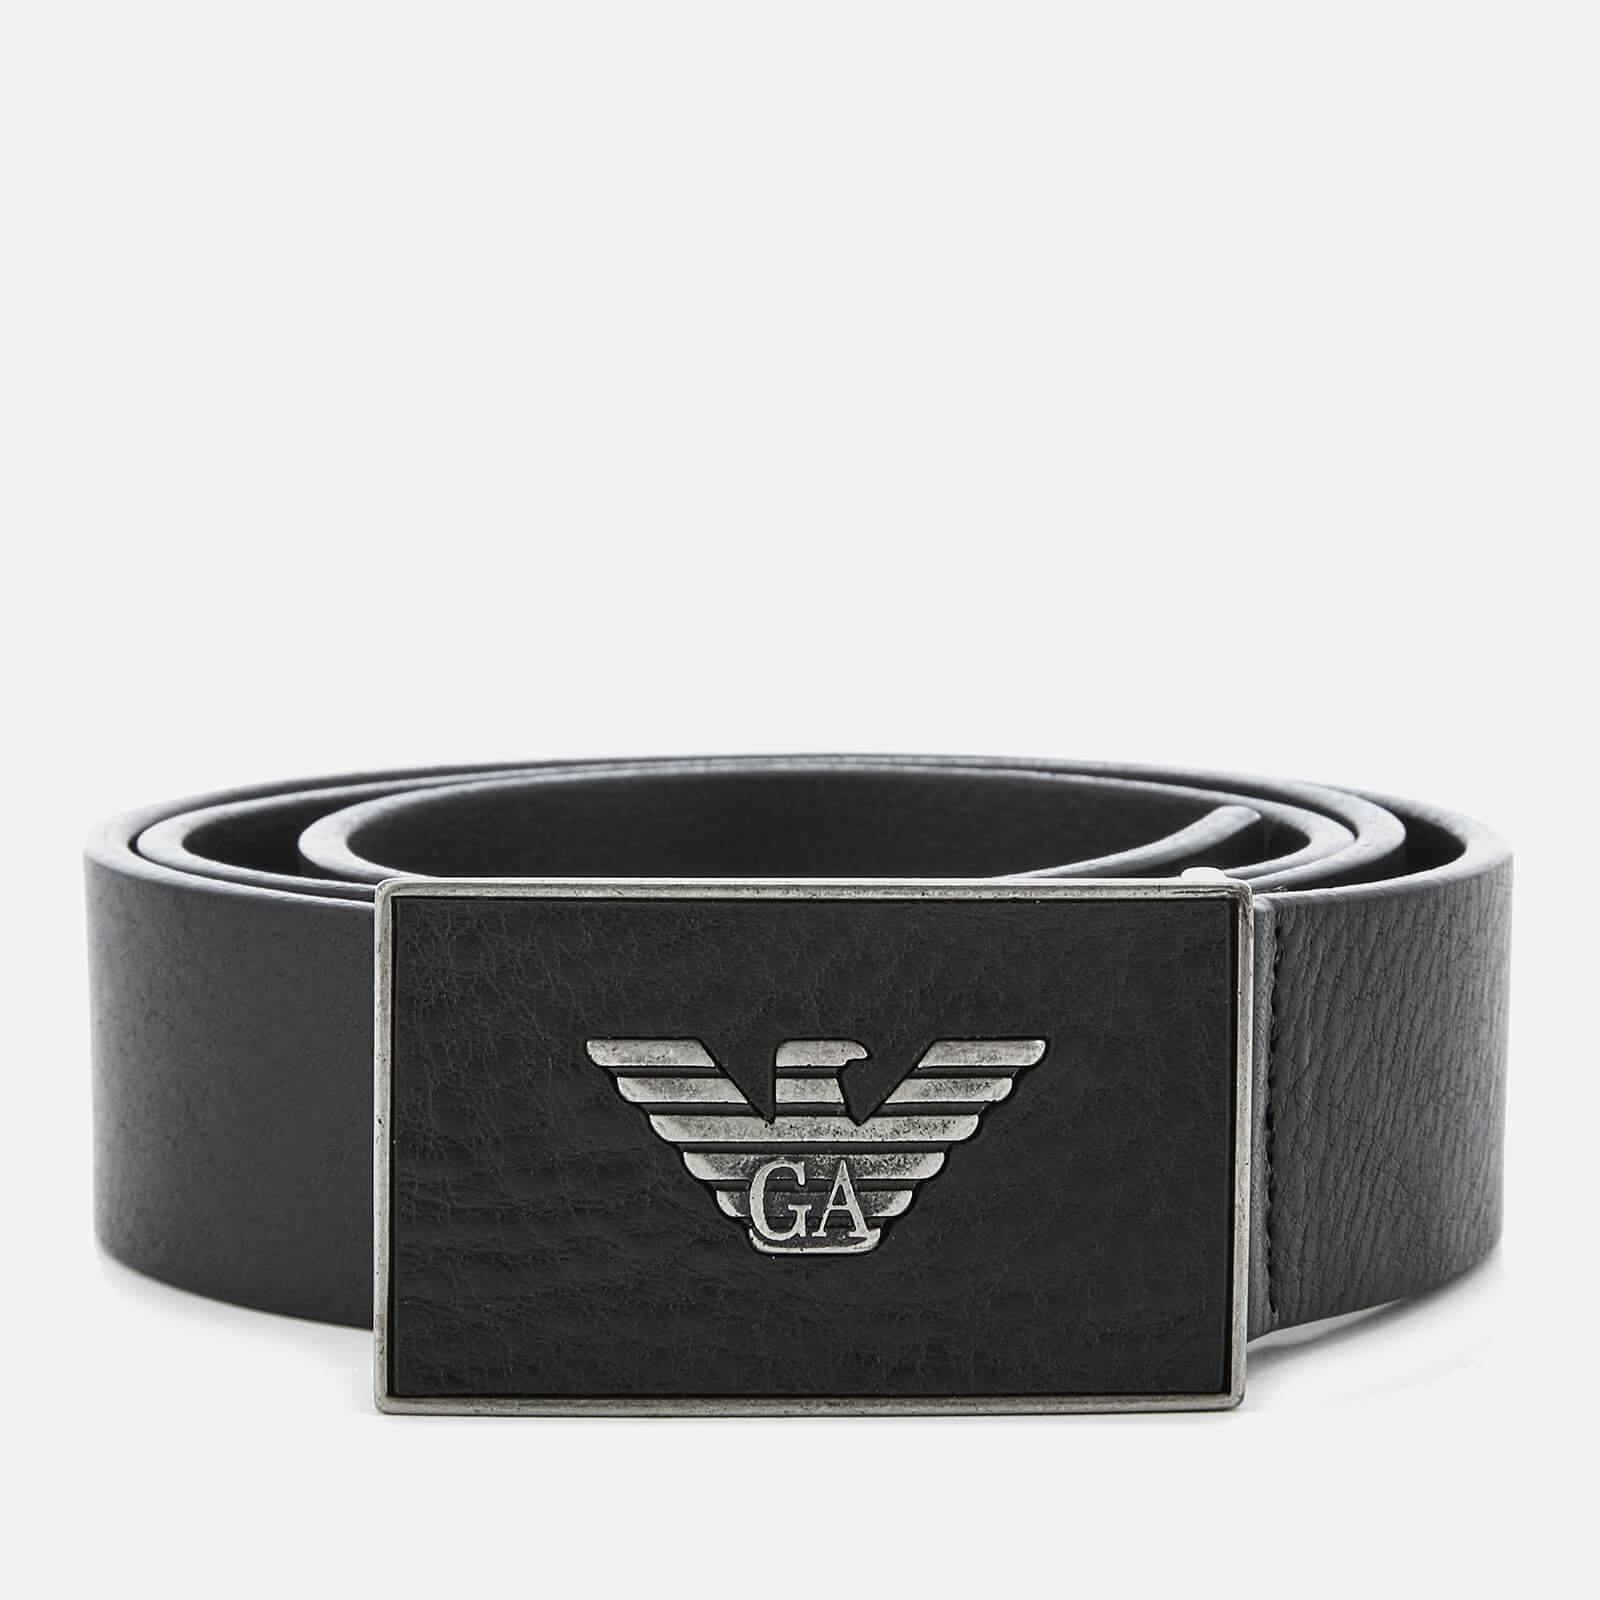 Emporio Armani s Plate Belt - Black - EU 95/W38 - Black